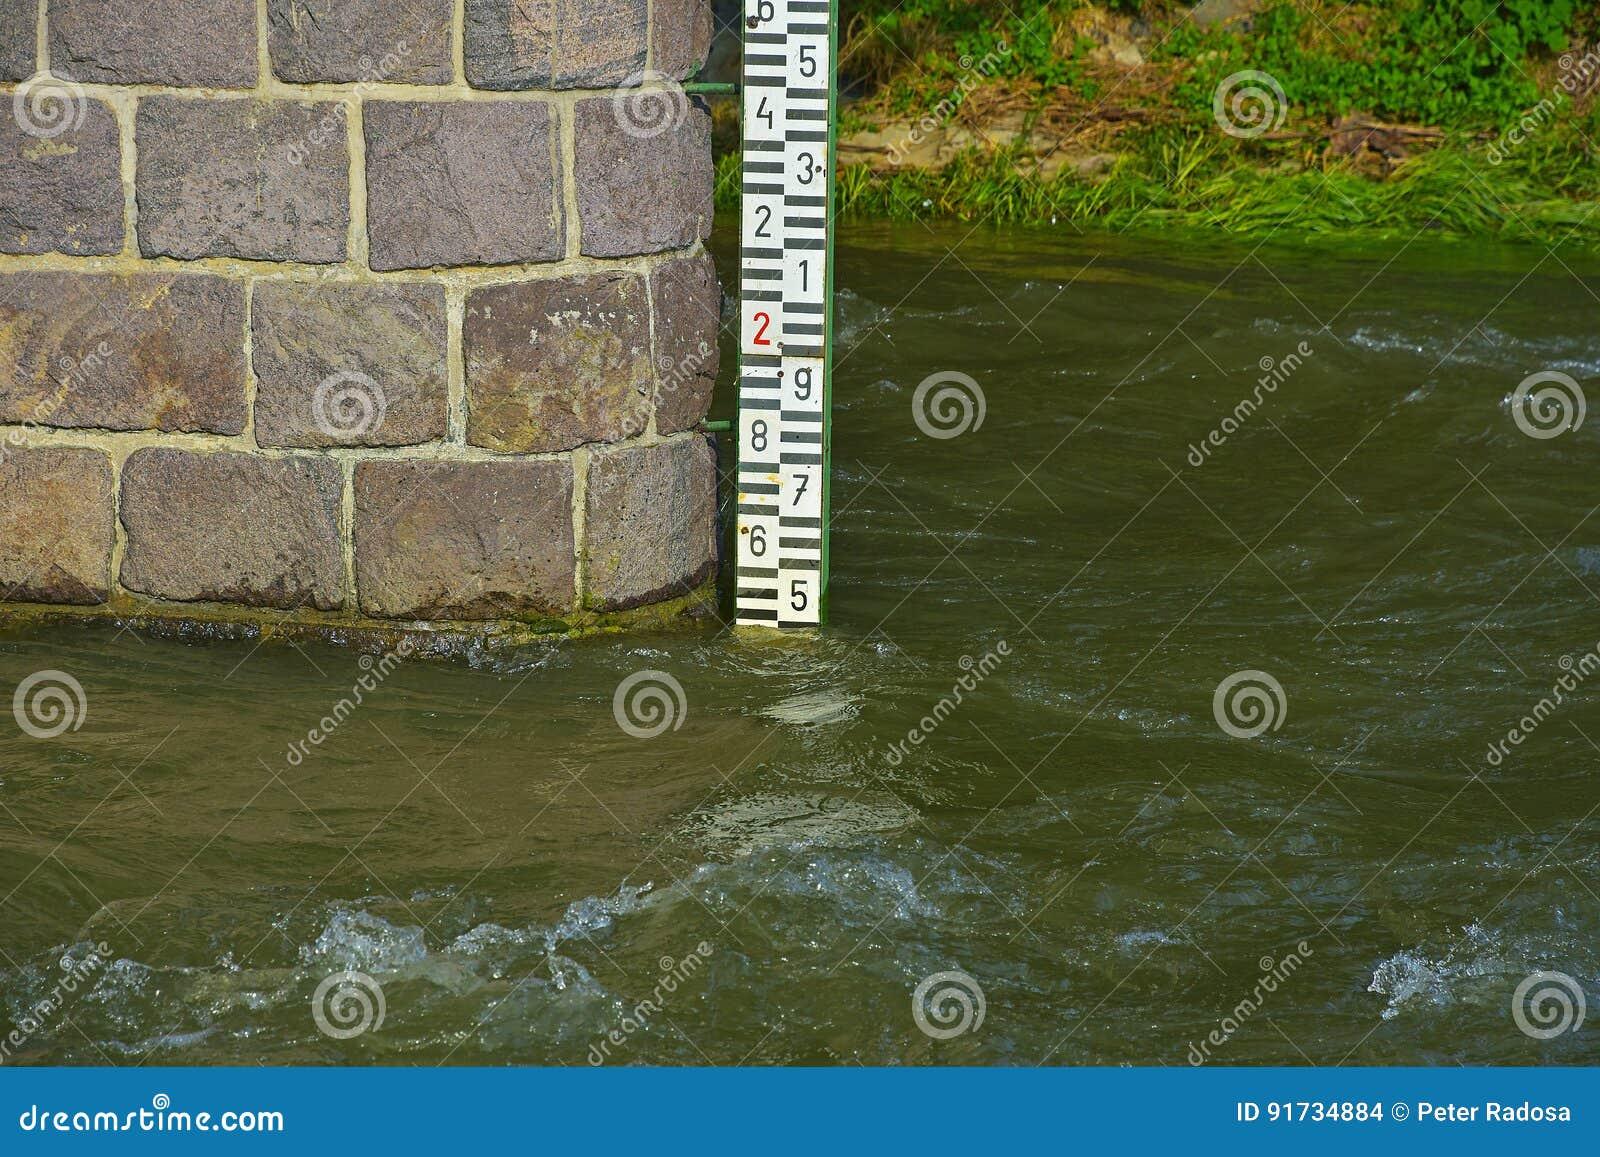 Метр уровня воды